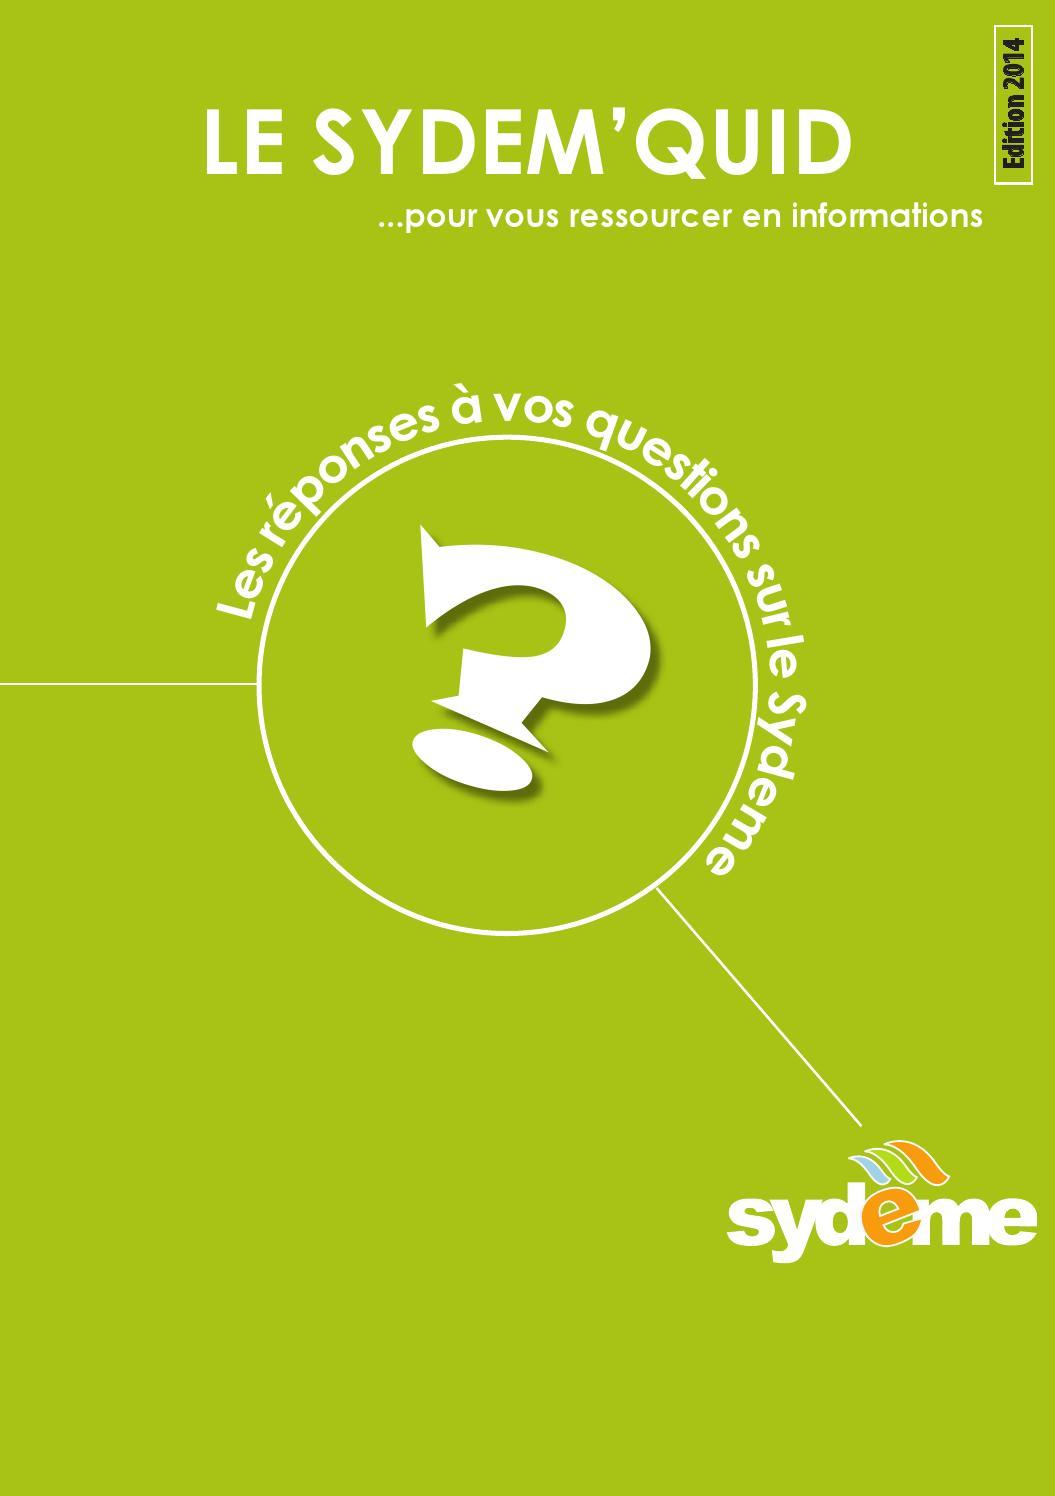 Super remise bons plans 2017 grande sélection Sydem quid 2014 version web by SYDEME - issuu